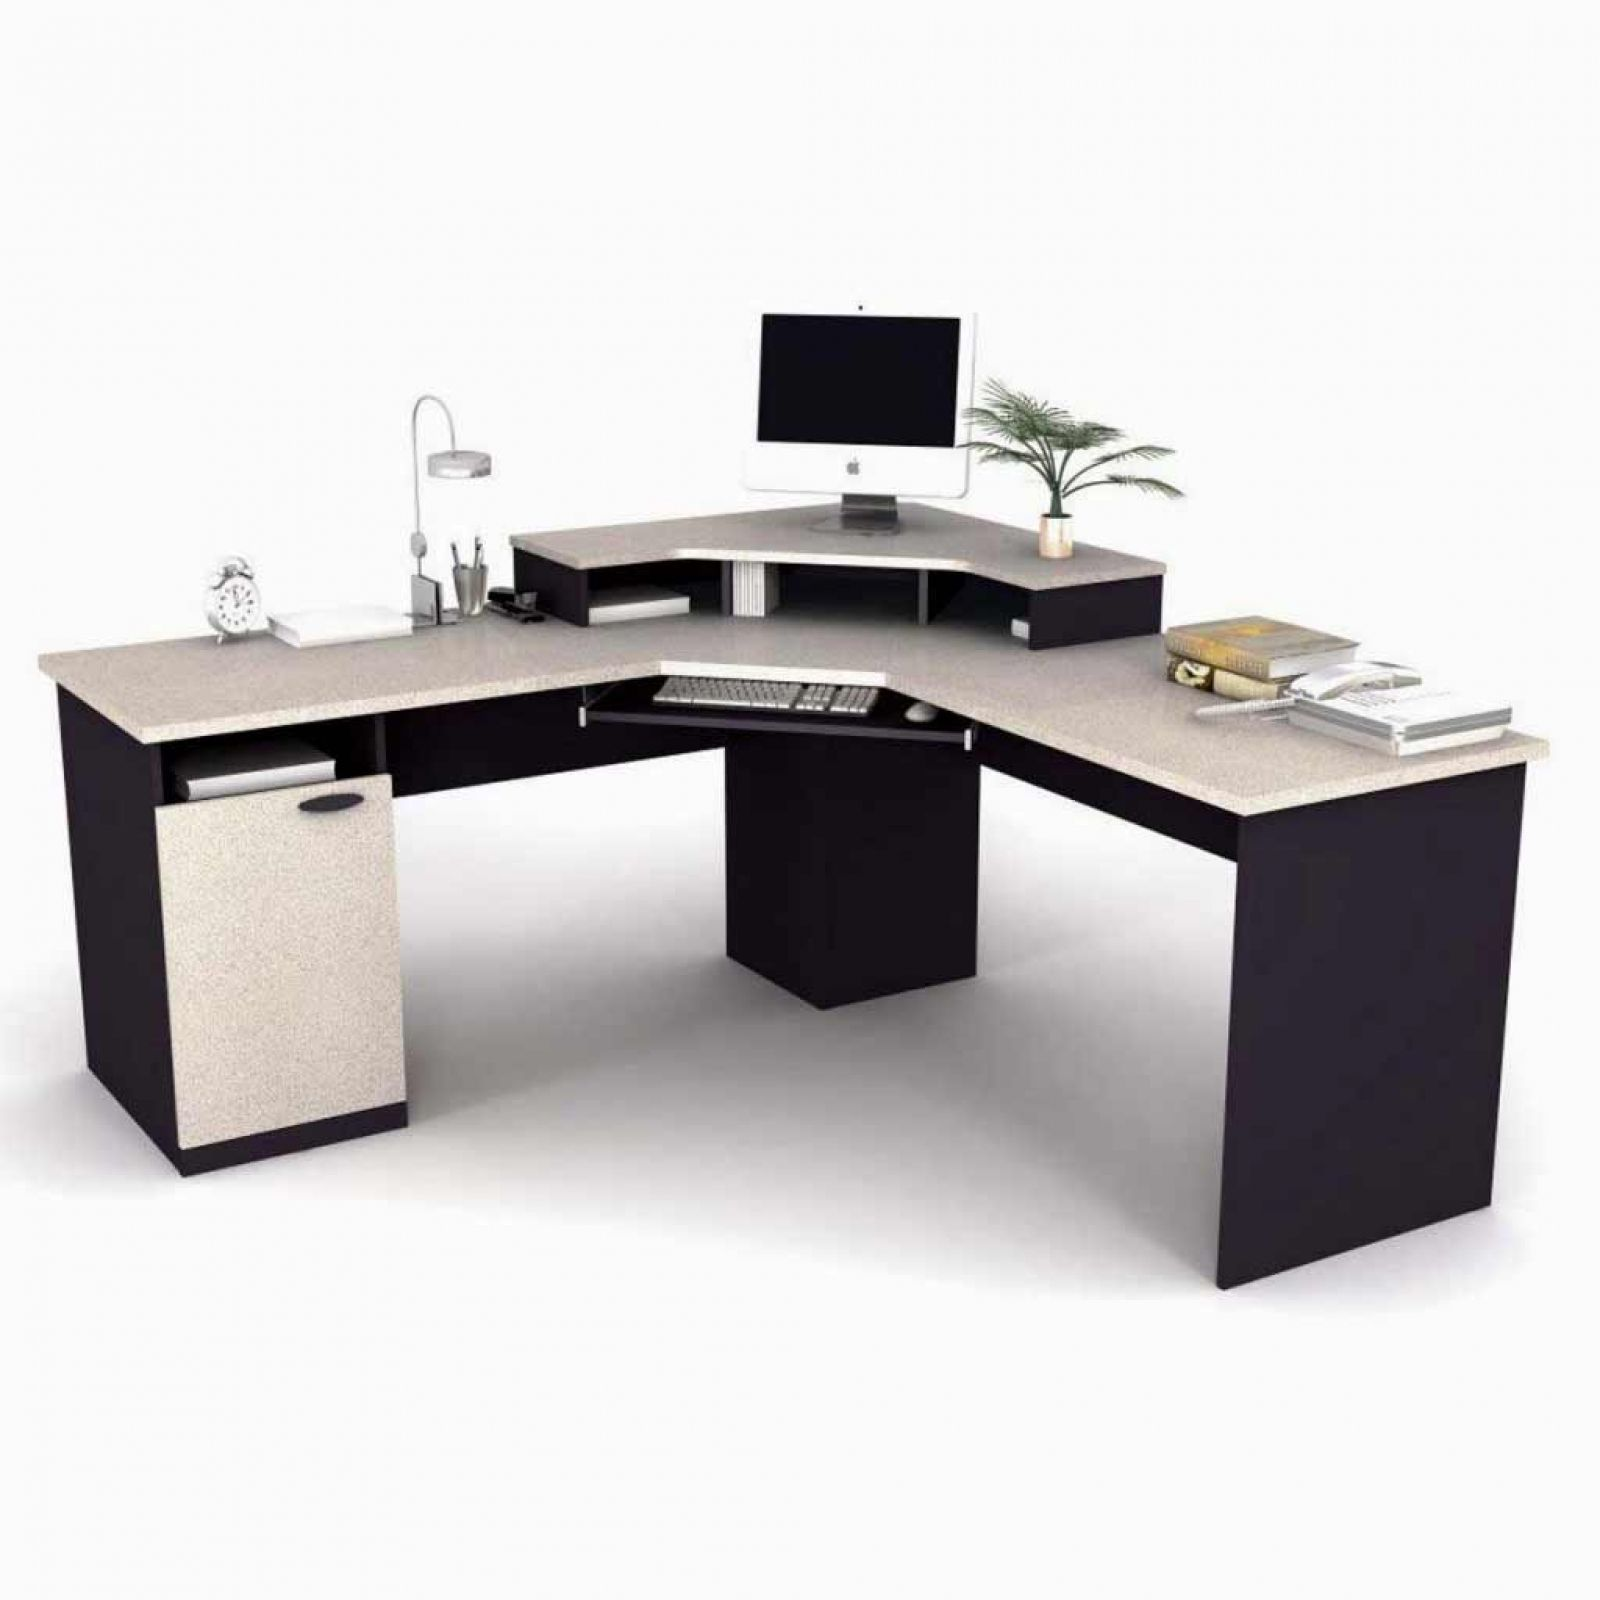 27+ DIY Computer Desk Ideas U0026 Tutorials For Home Office Tags: Computer Desk  Ideas